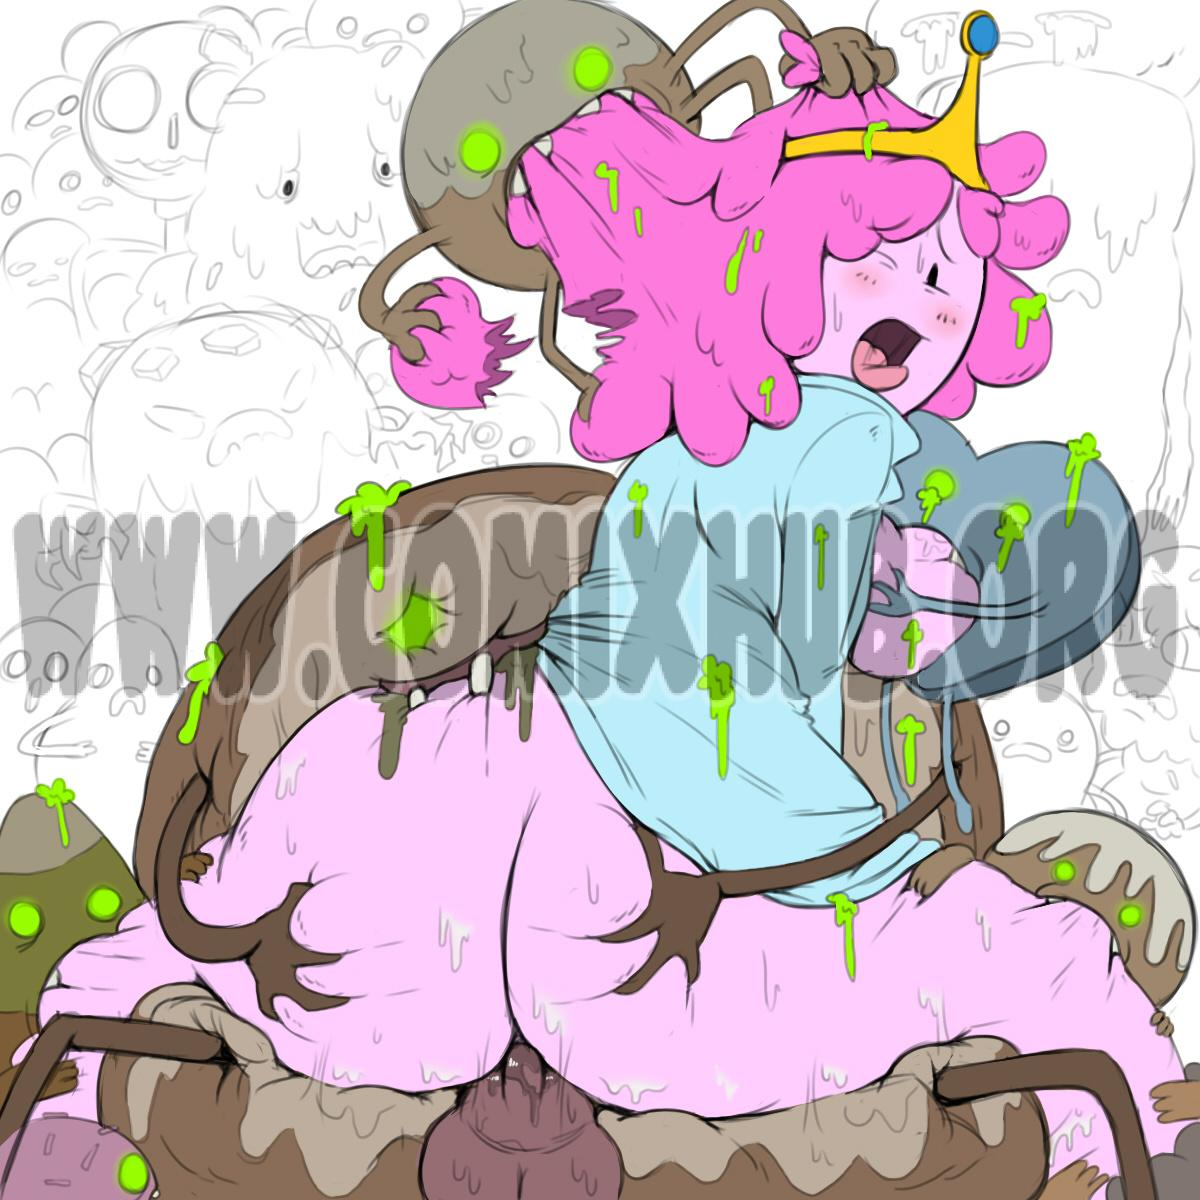 Adventure Time - Mini Comics porn comics Oral sex, cunnilingus, Group Sex, Lesbians, Monster Girls, Rape, Straight